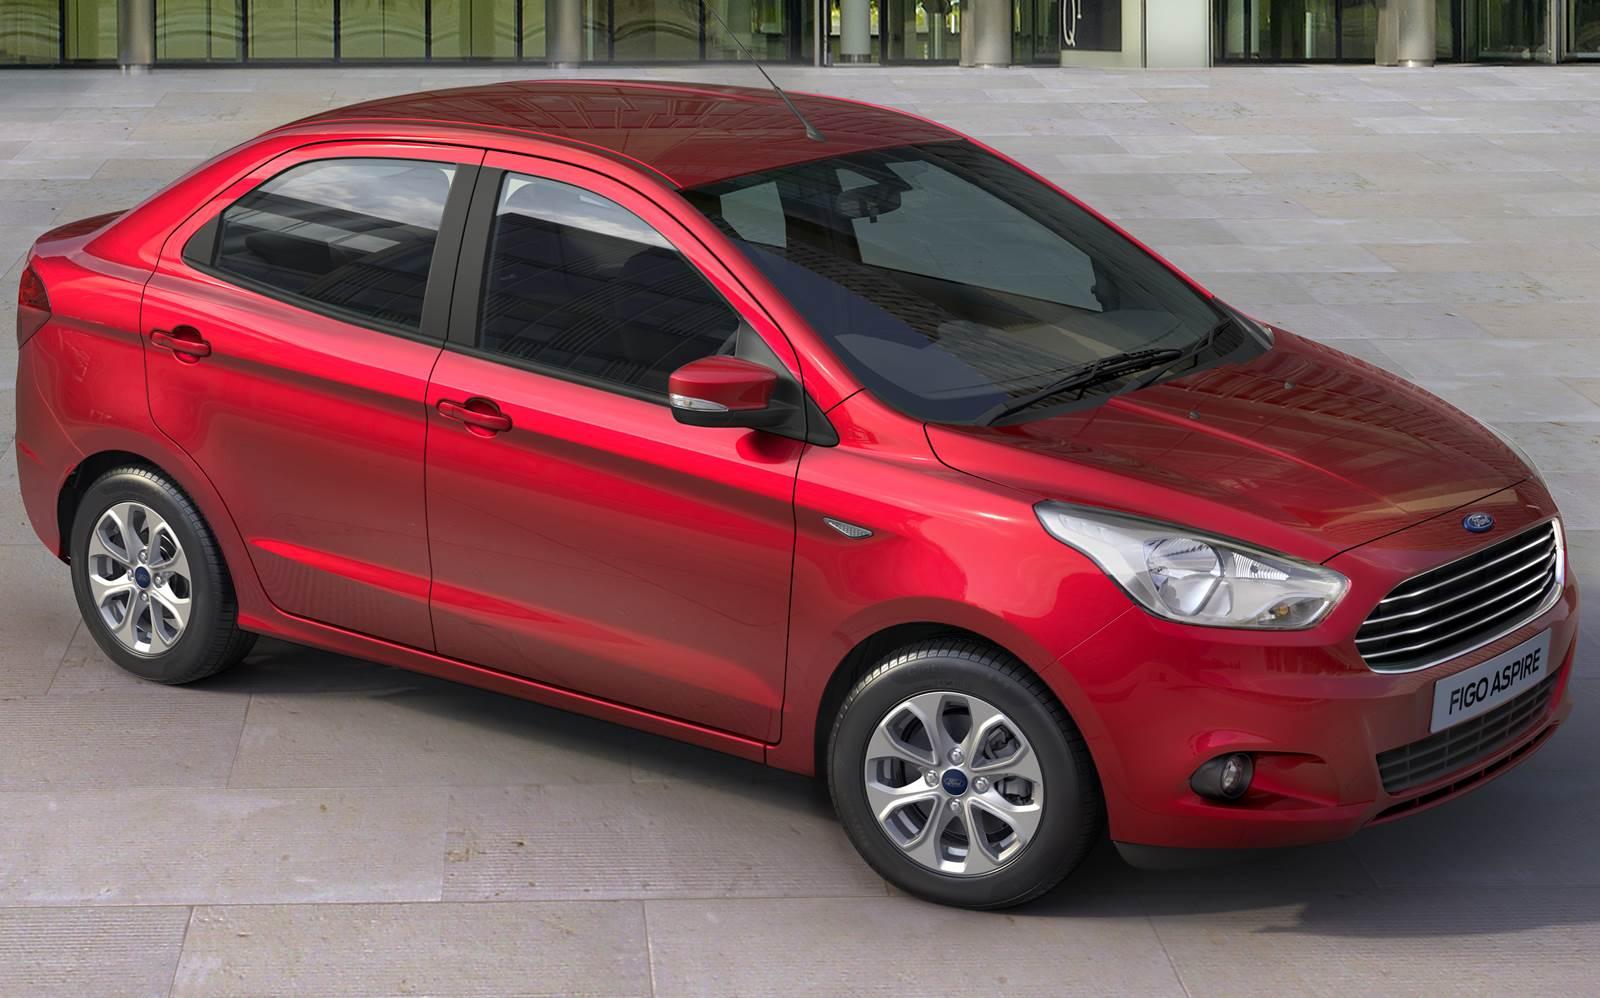 Novo Ford Ka+ Sedan - Figo Aspire